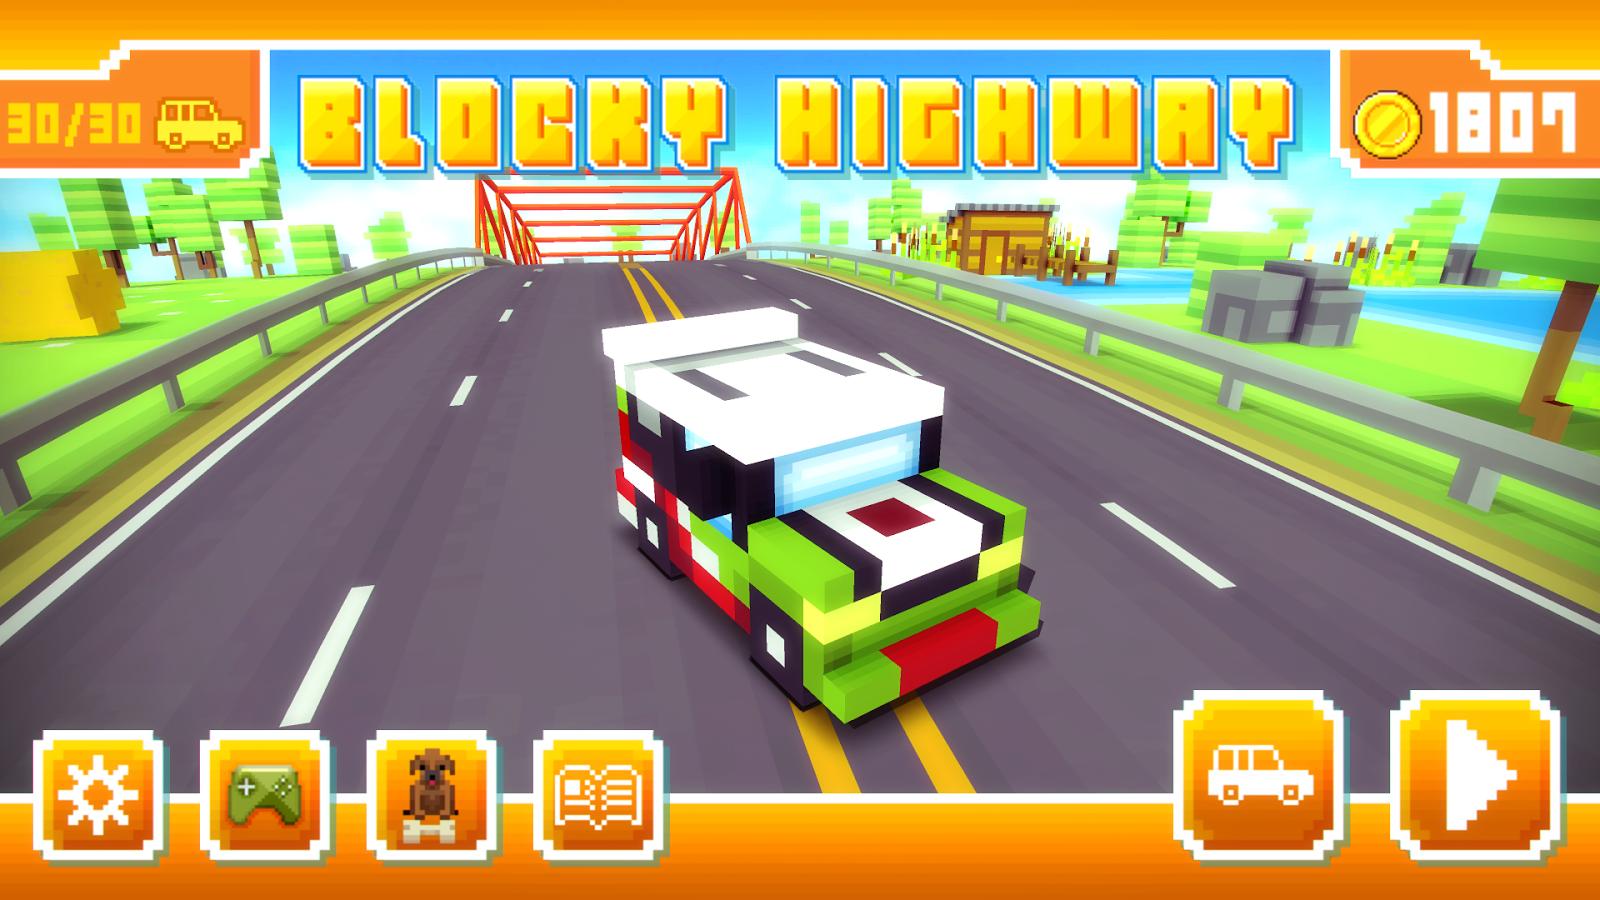 Blocky Highway1